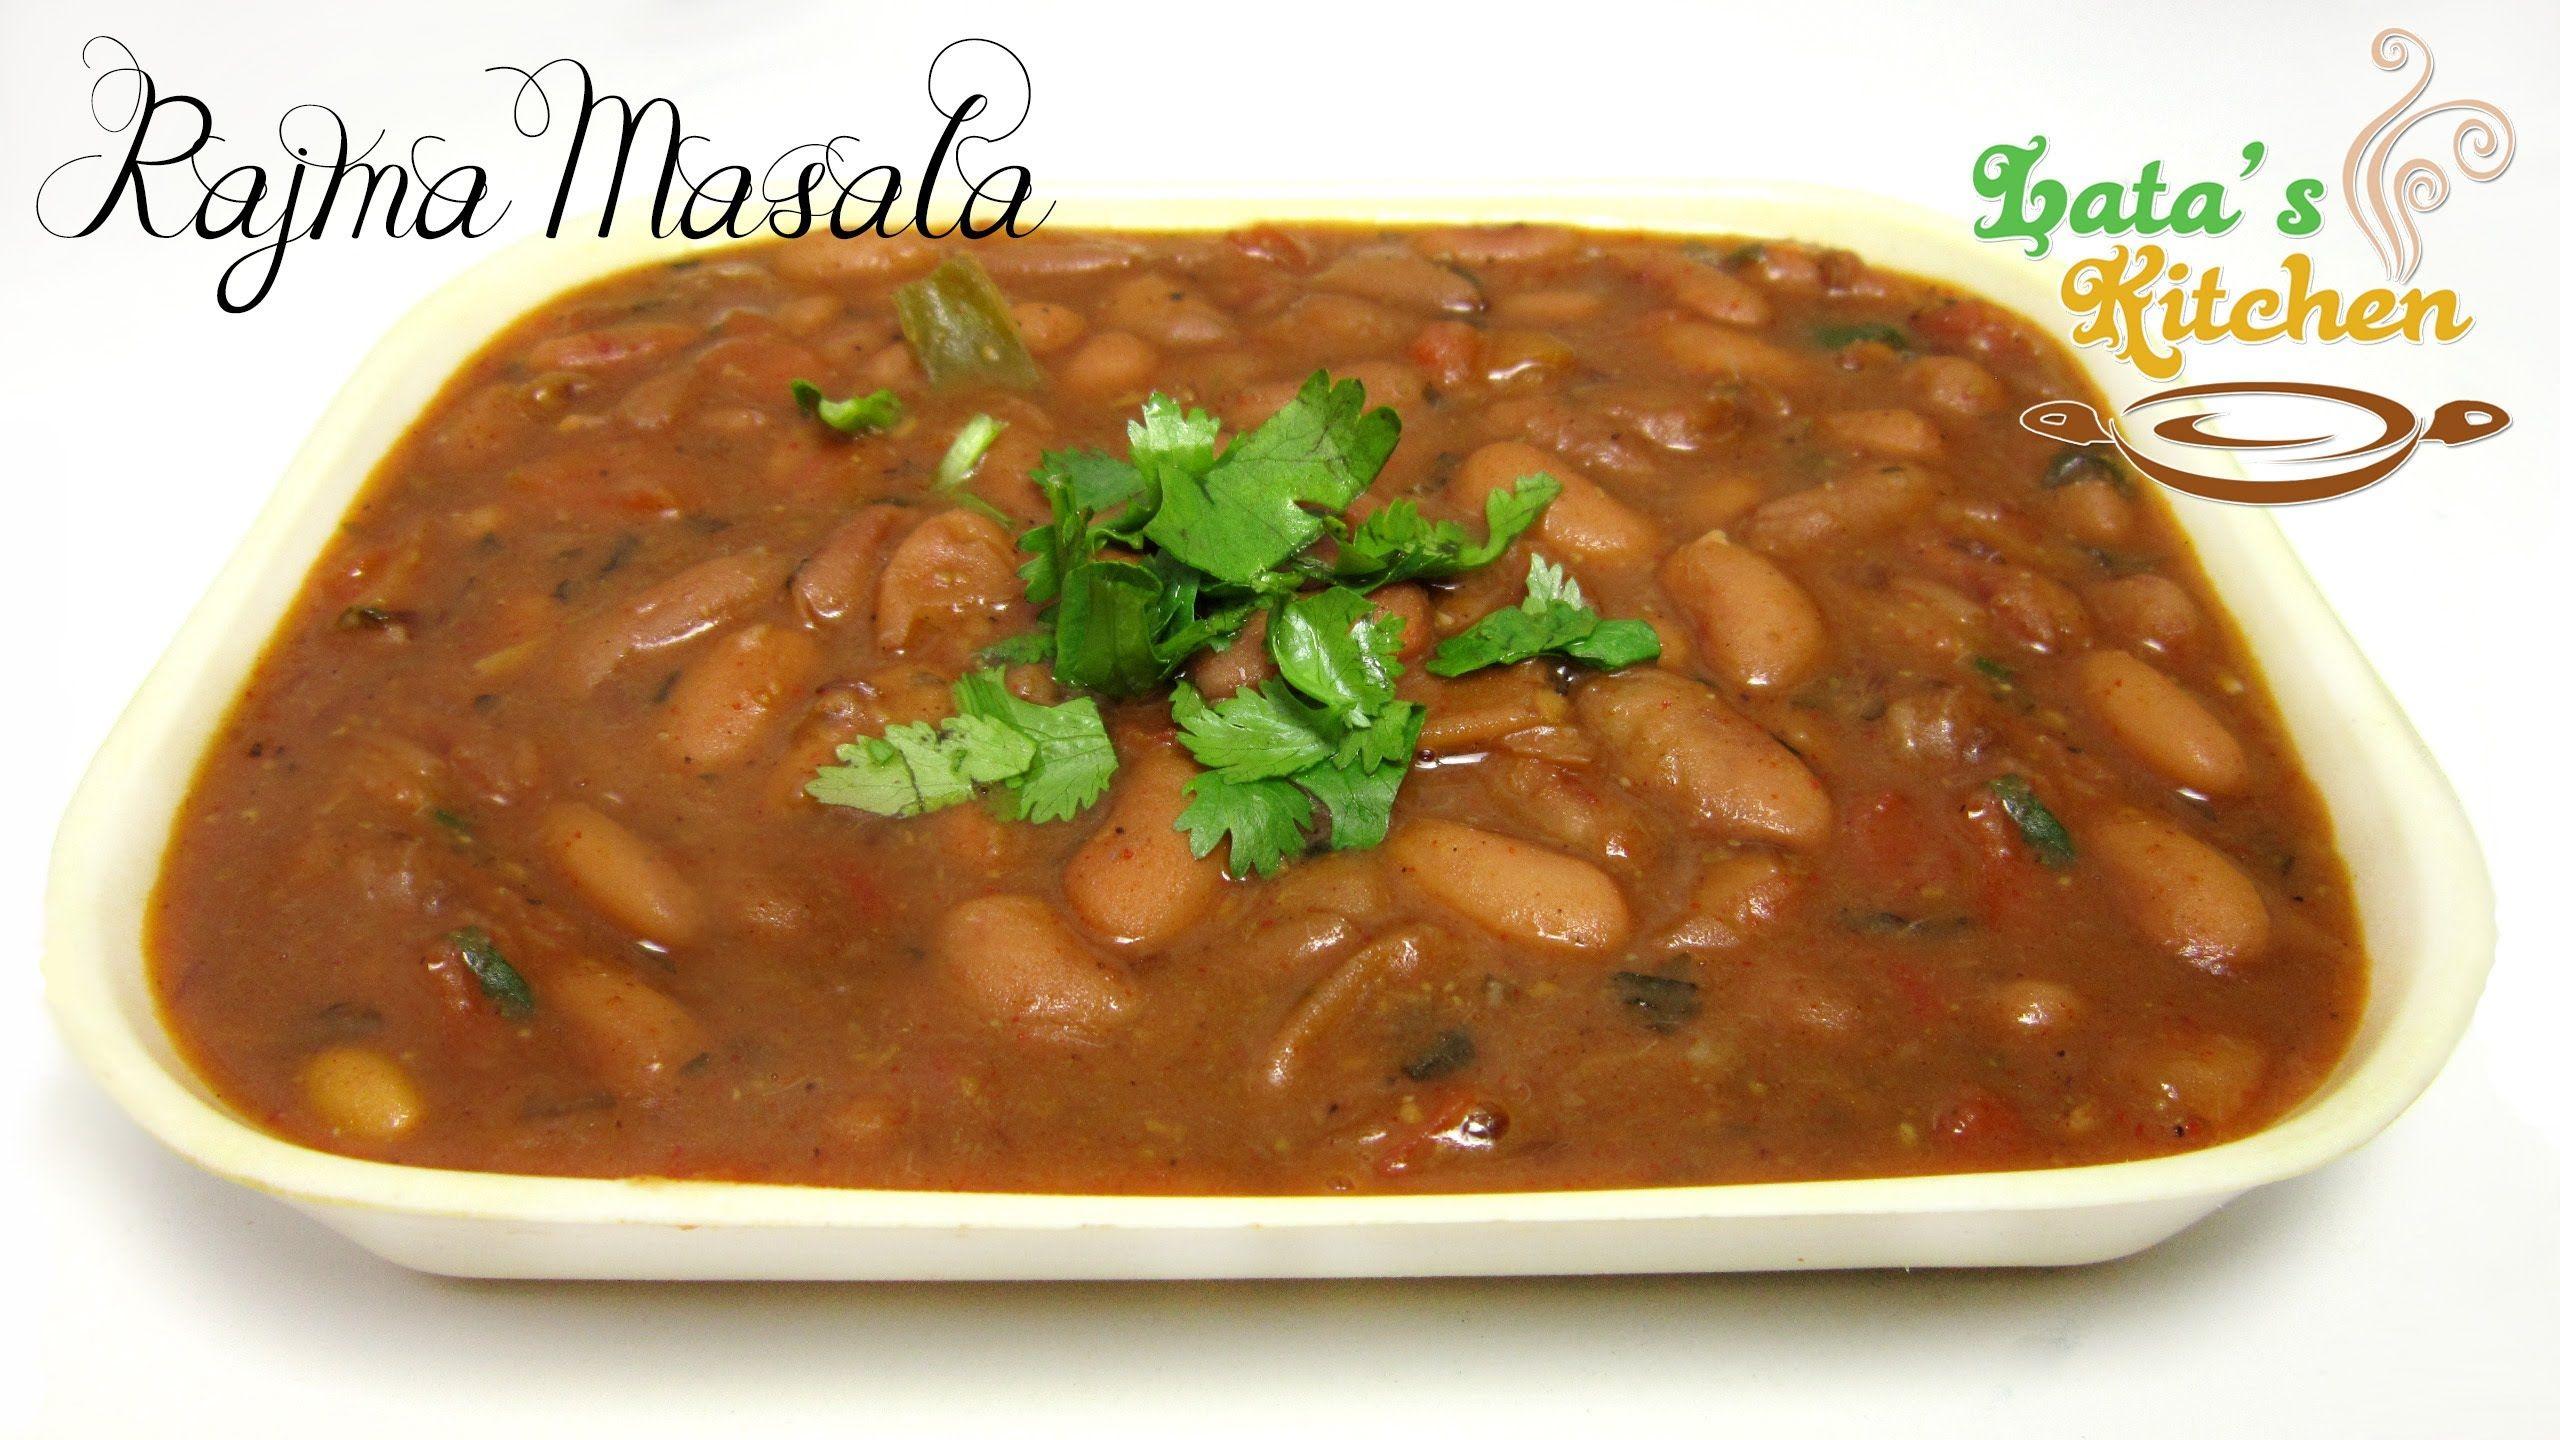 Rajma masala recipe indian vegetarian recipe video in hindi with rajma masala recipe indian vegetarian recipe video in hindi with english subtitles forumfinder Image collections